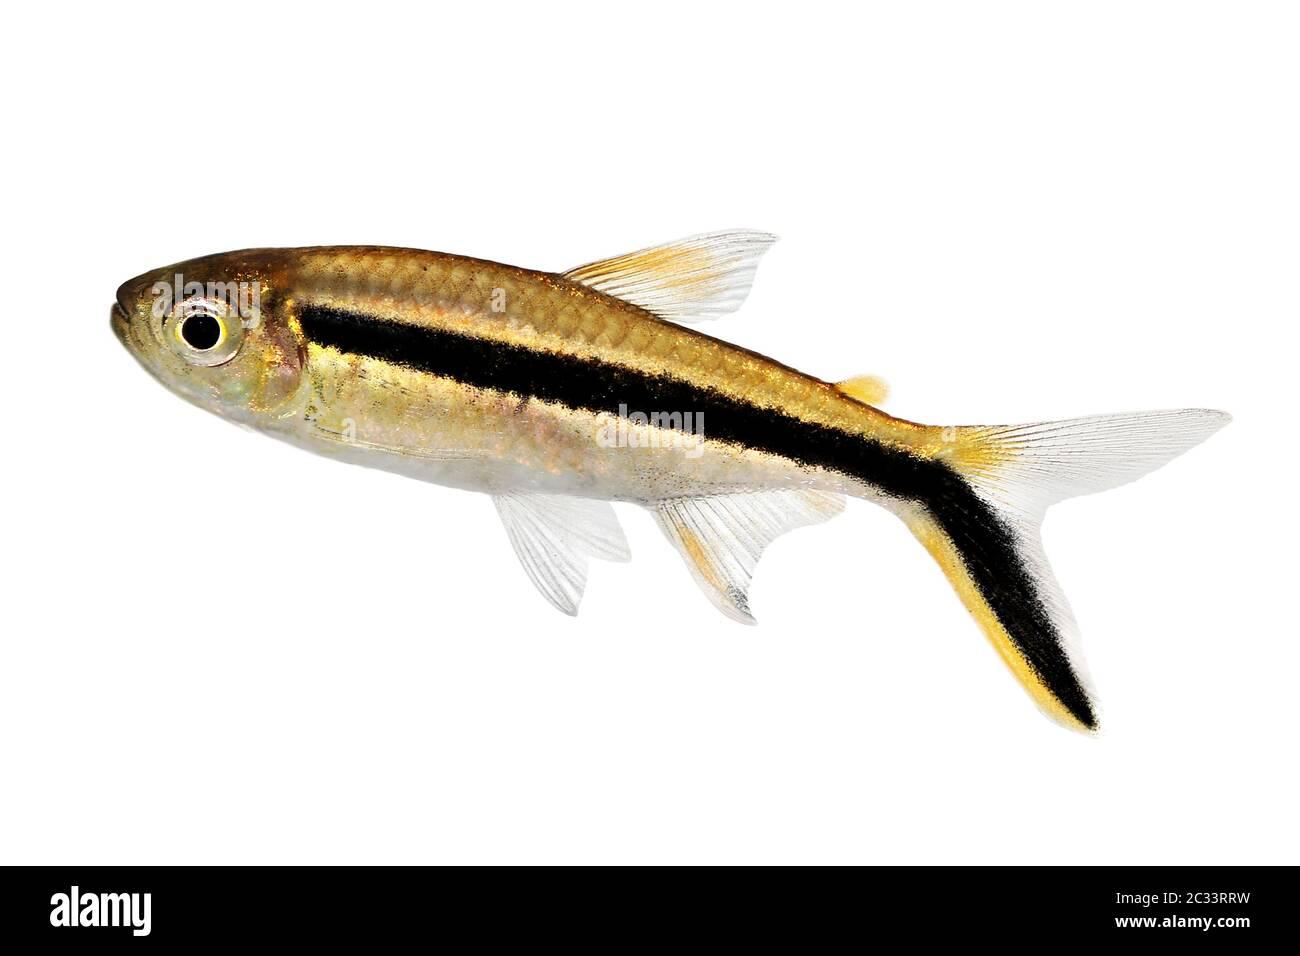 Penguin Tetra Thayeria Boehlkei Blackline Penguinfish Aquarium Fish Stock Photo Alamy